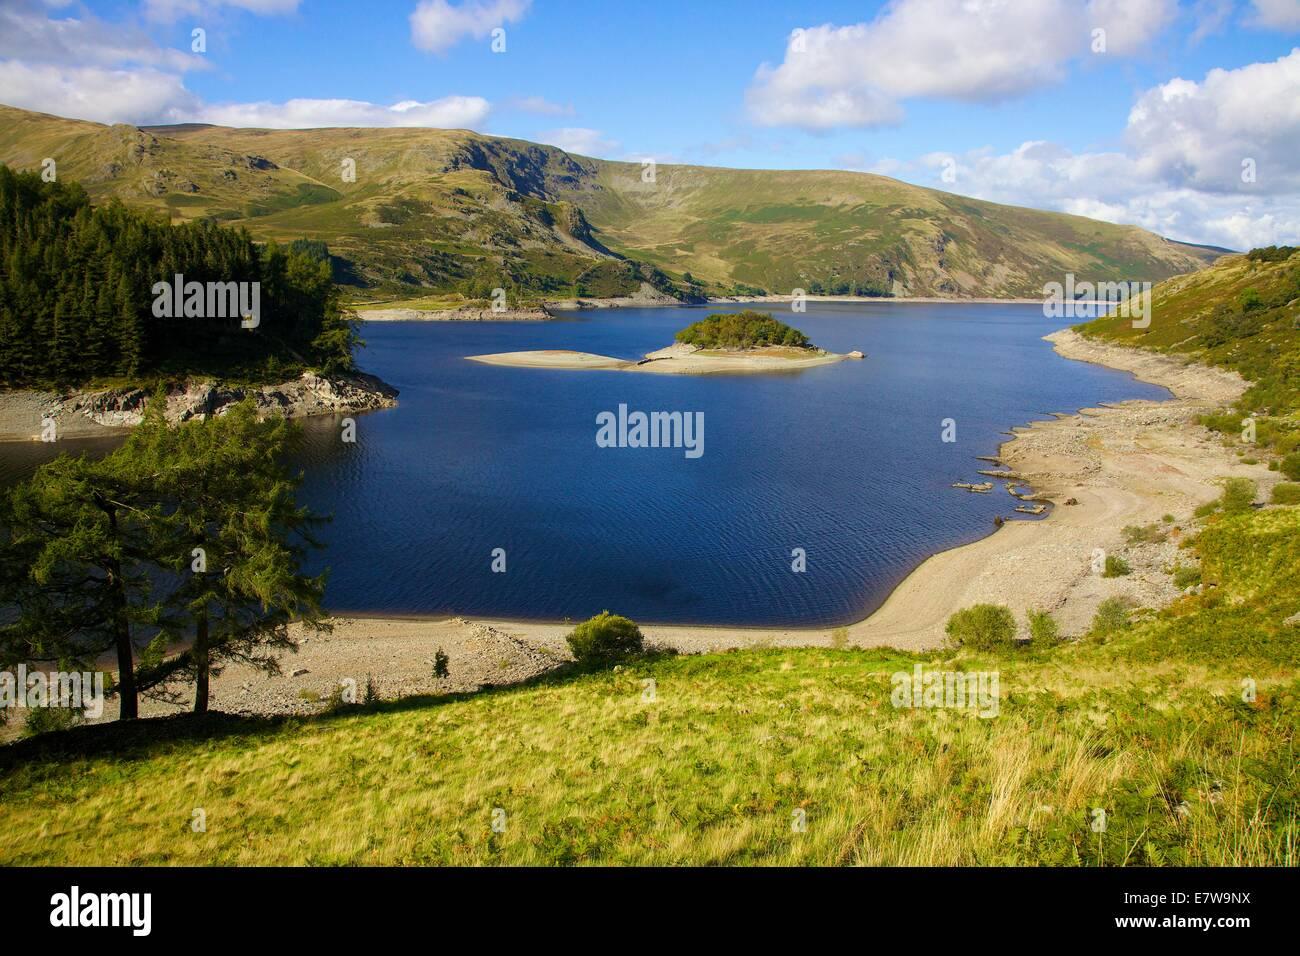 Lake District National Park, Cumbria, UK. 24th Sep, 2014. Mardale village emerges from Hawswater, Lake District - Stock Image